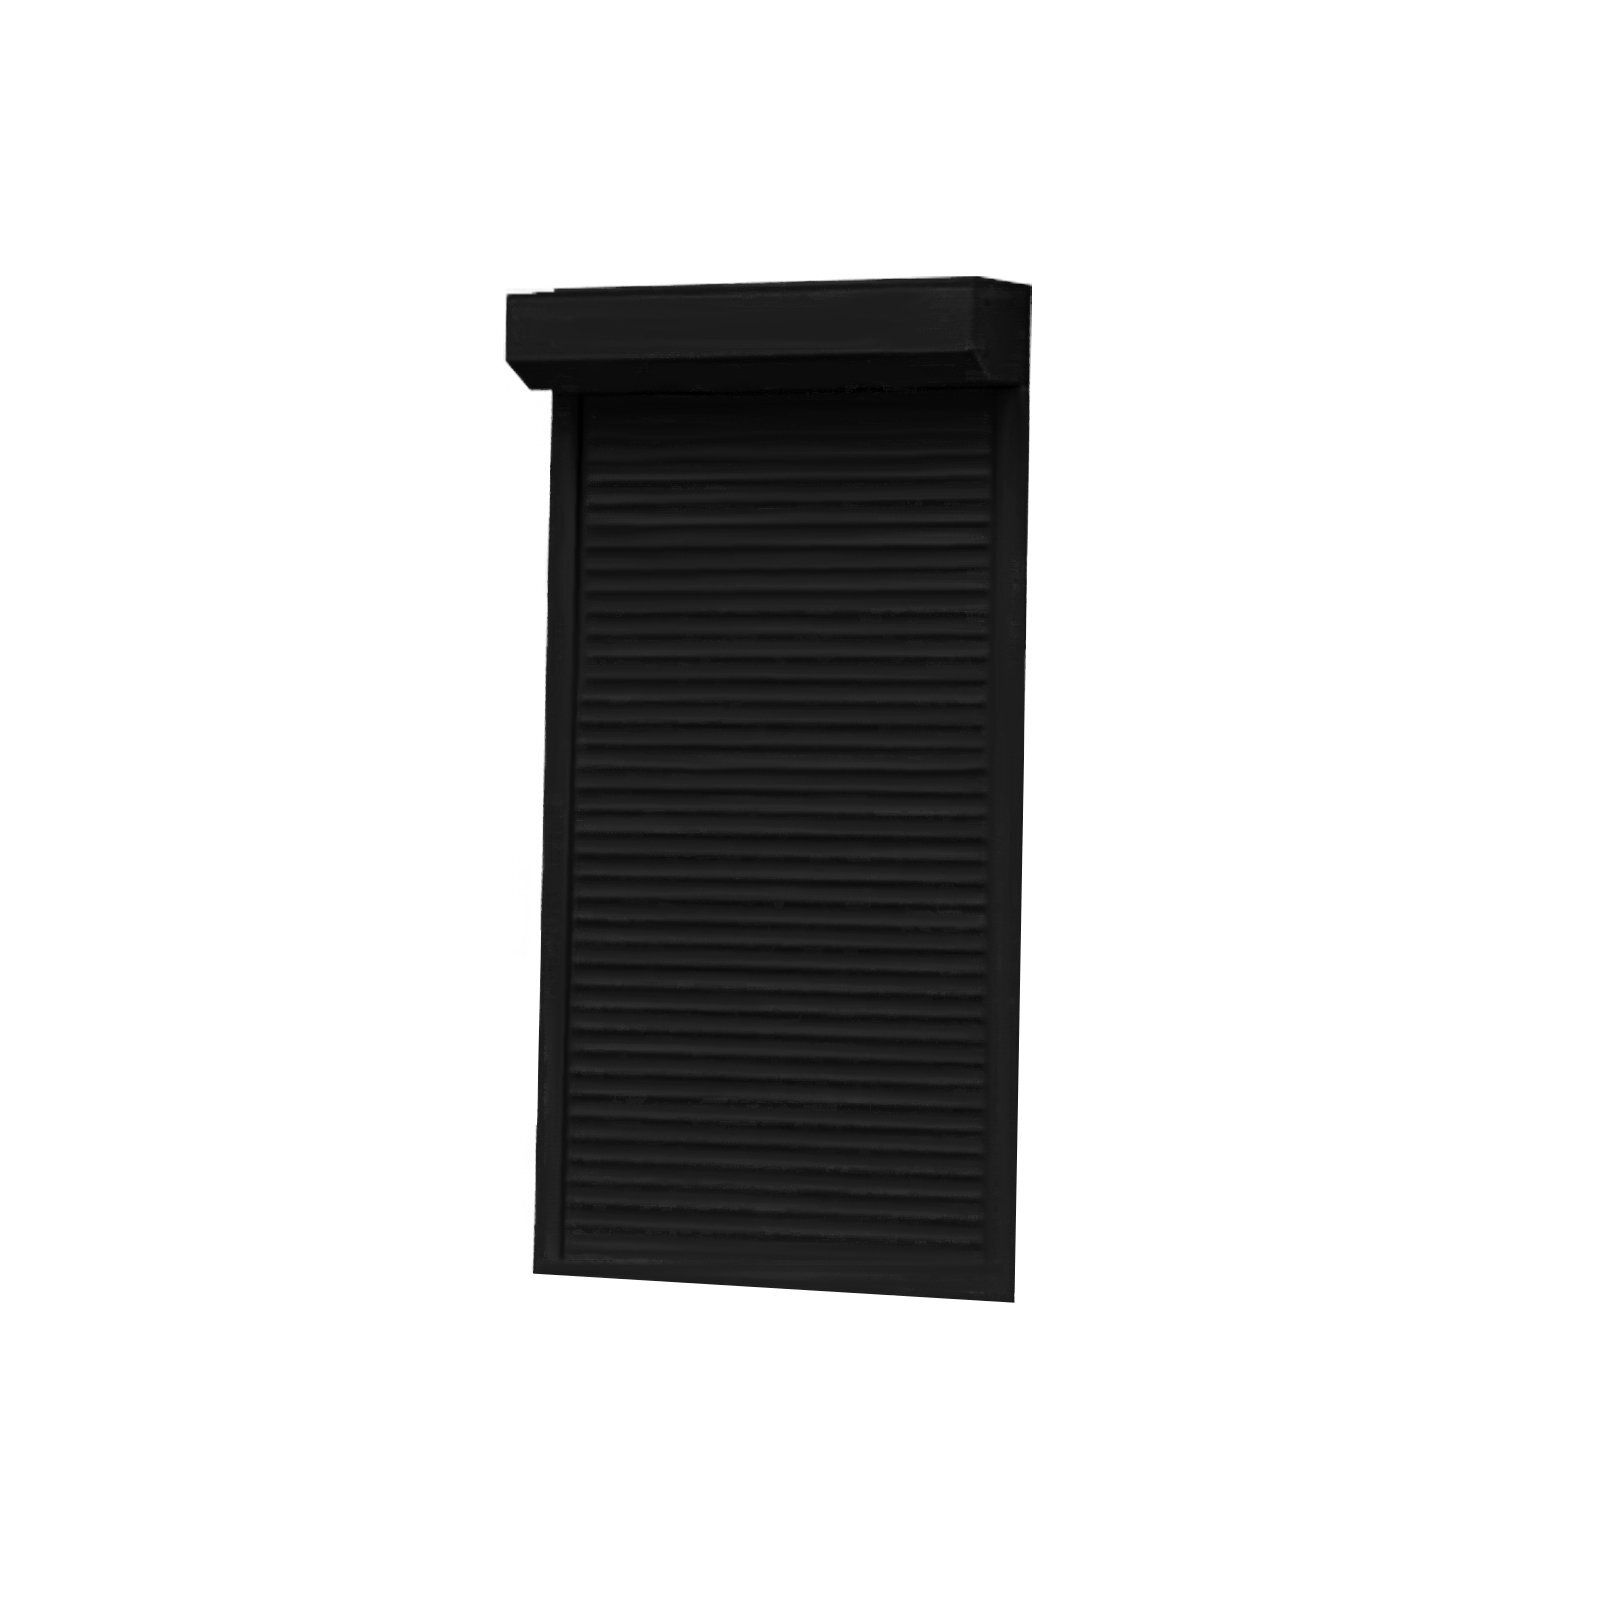 Everton 1801-2000mm H x 1801-2000mm W On-Wall Battery Roller Shutter